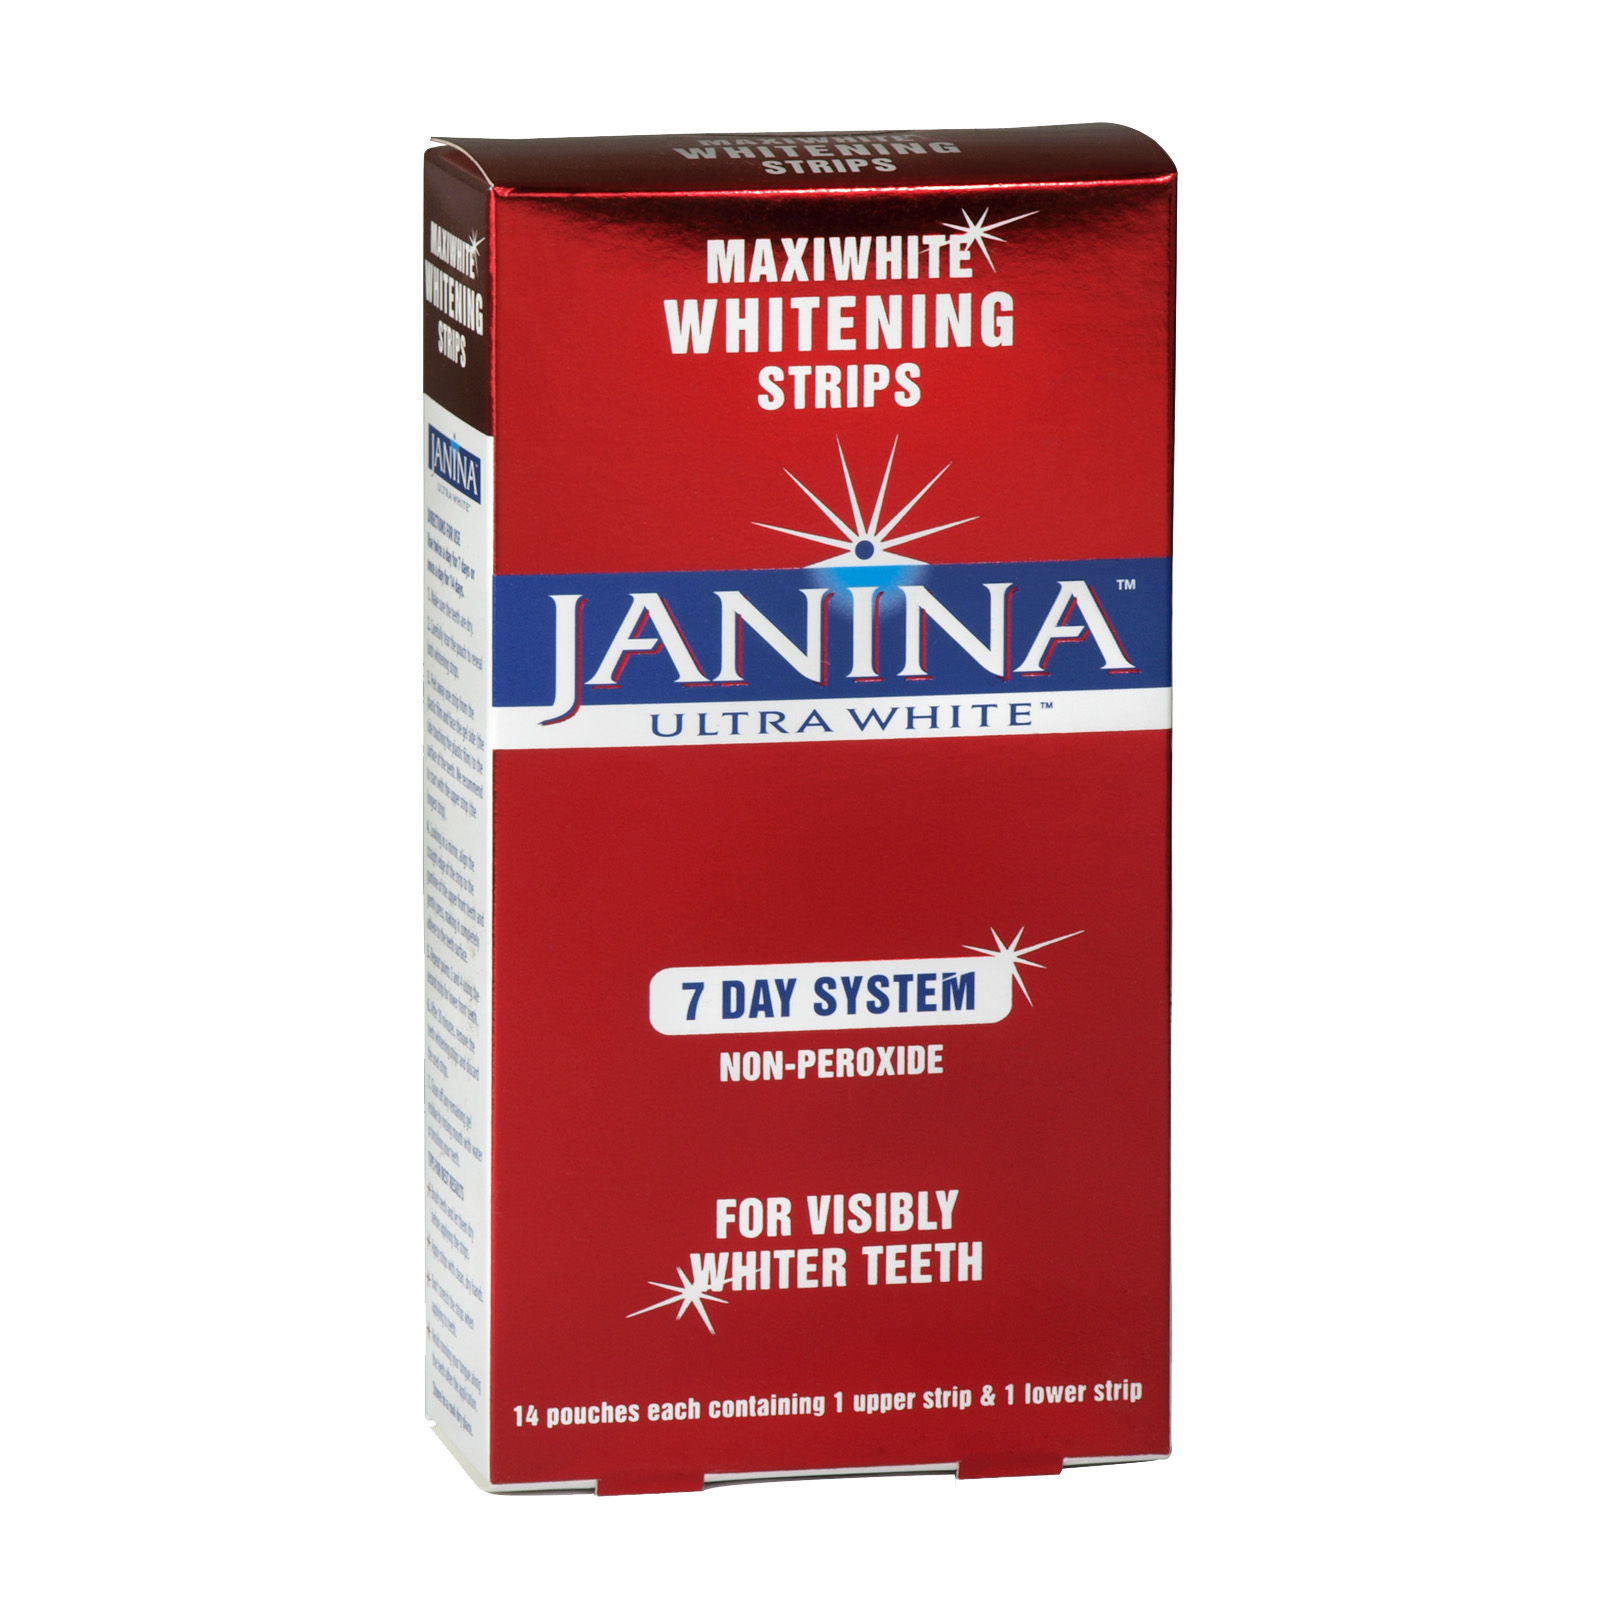 JANINA ULTRA WHITENING TOOTHPASTE 7 DAY SYSTEM WHITENING STRIPS